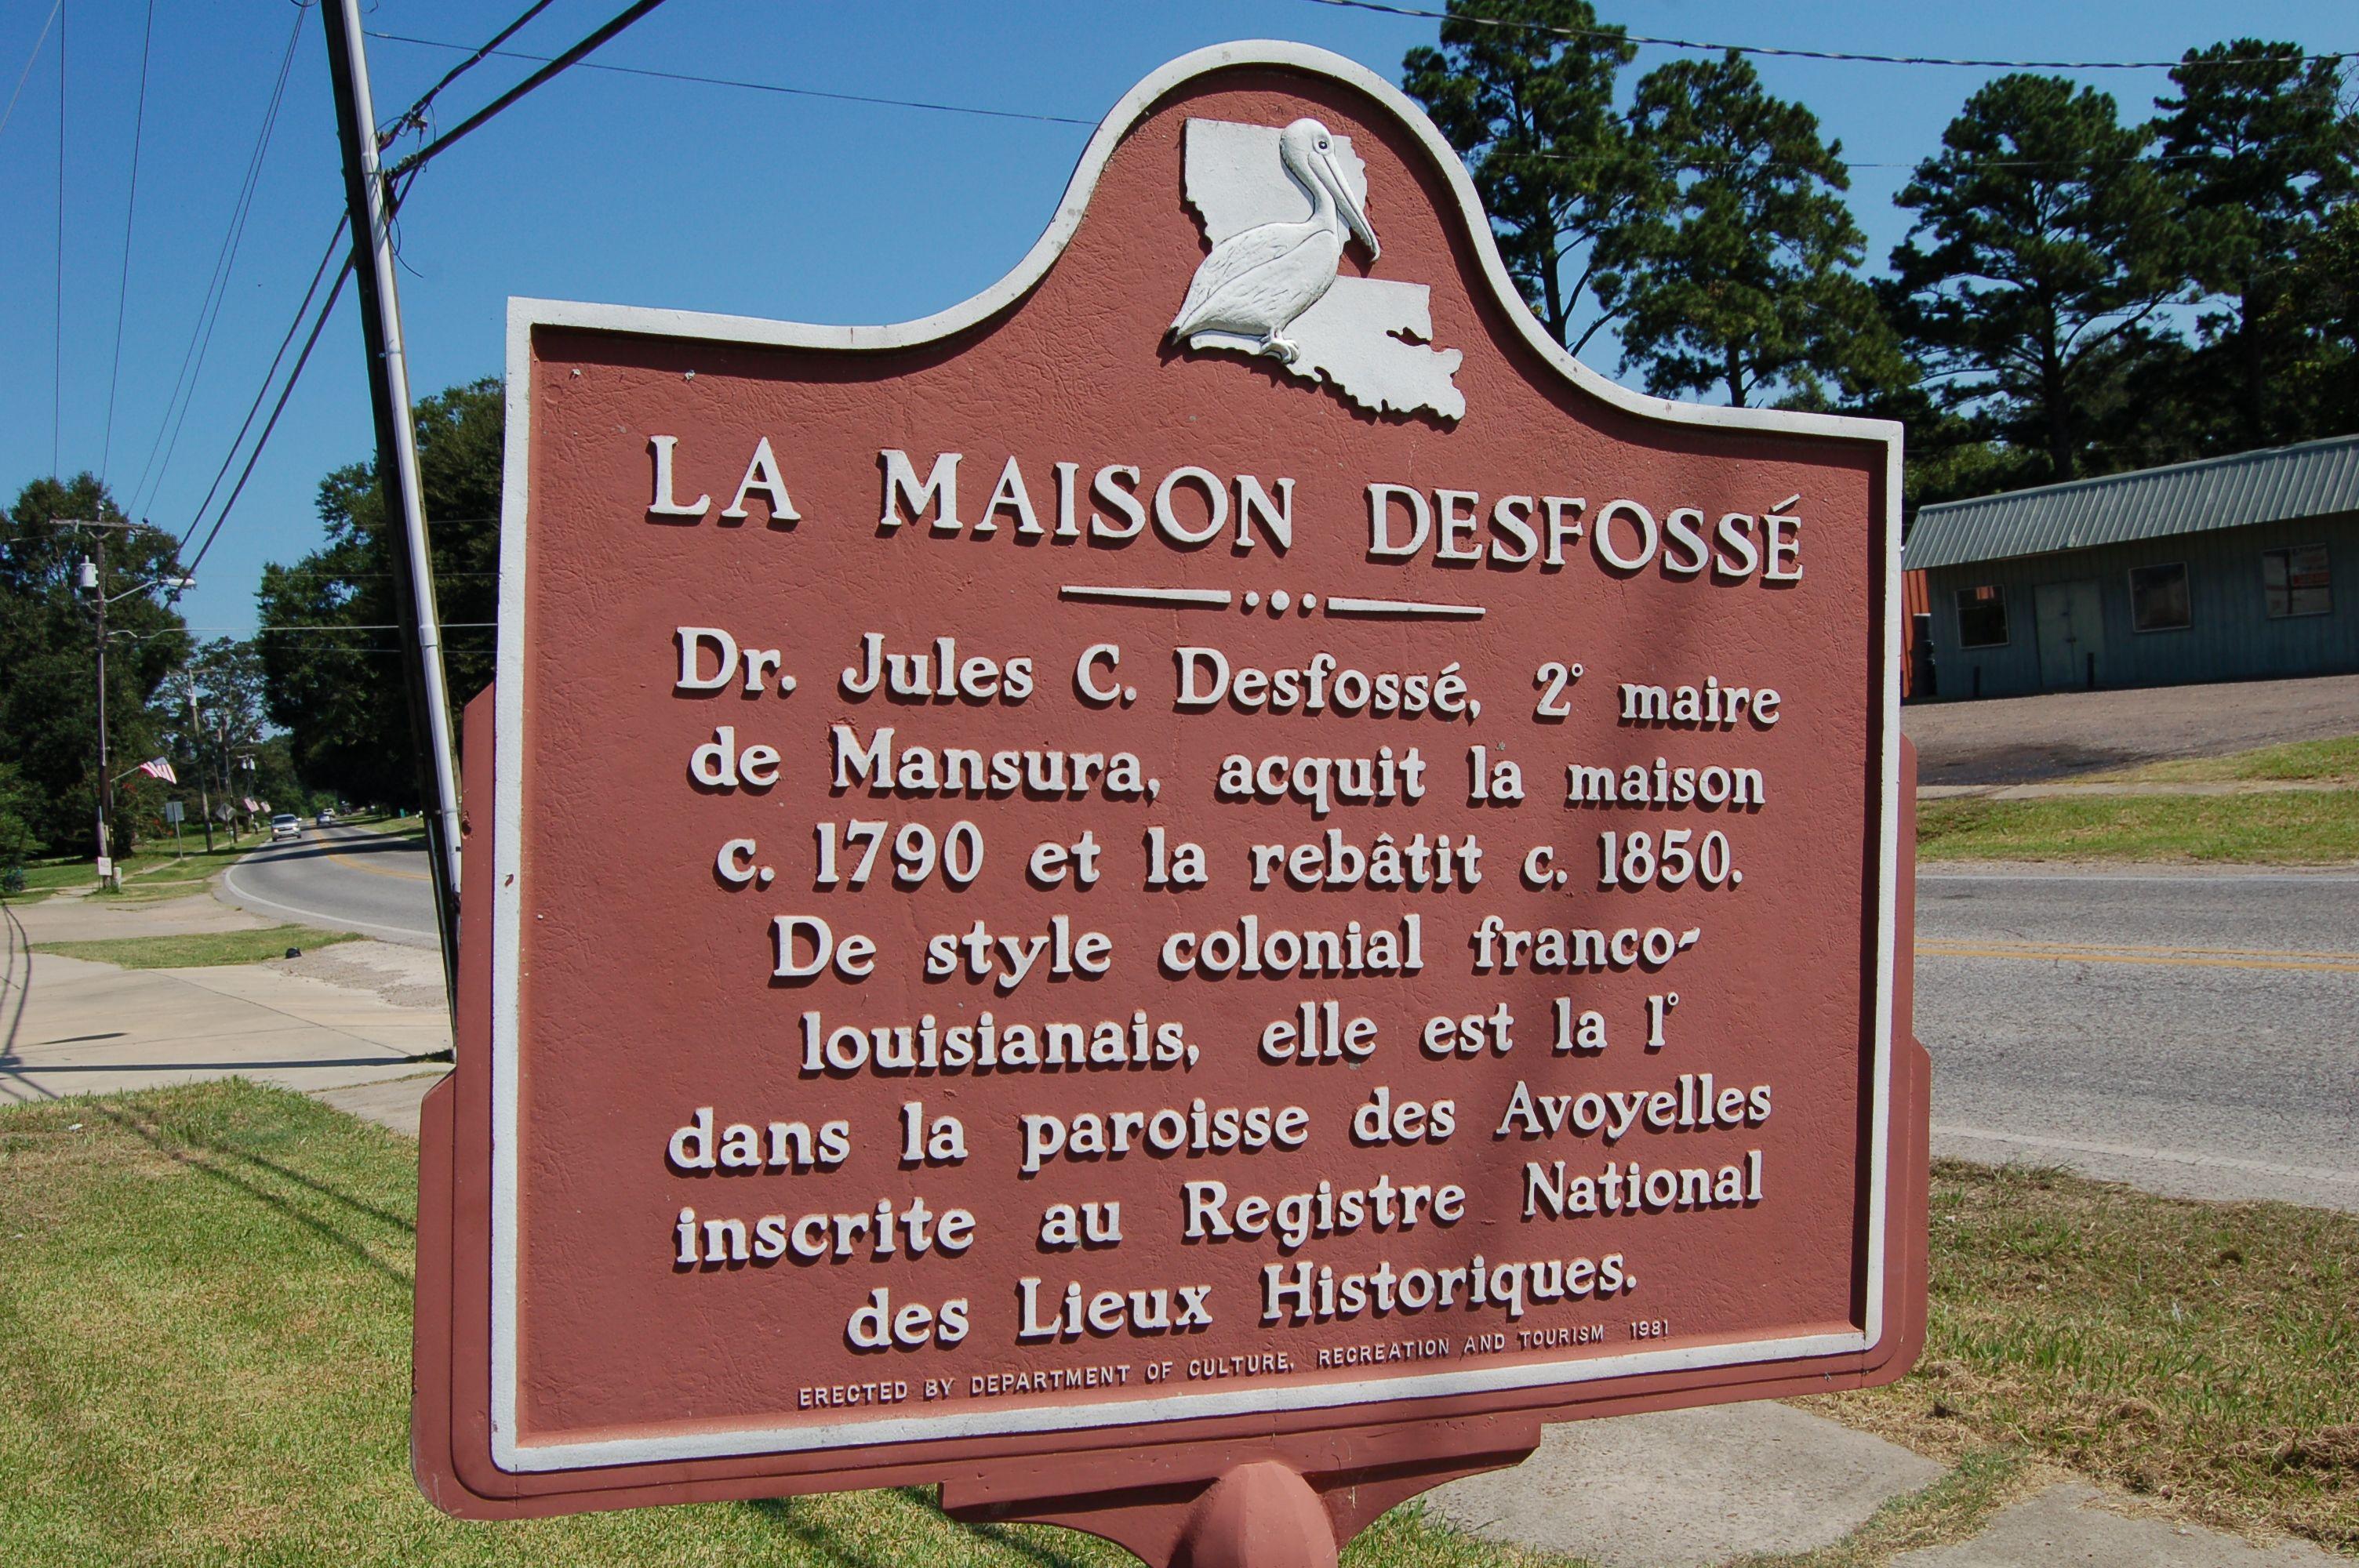 La Maison Desfosse Defosse House Mansura Avoyelles Parish Louisiana In French Historical Marker American History Louisiana